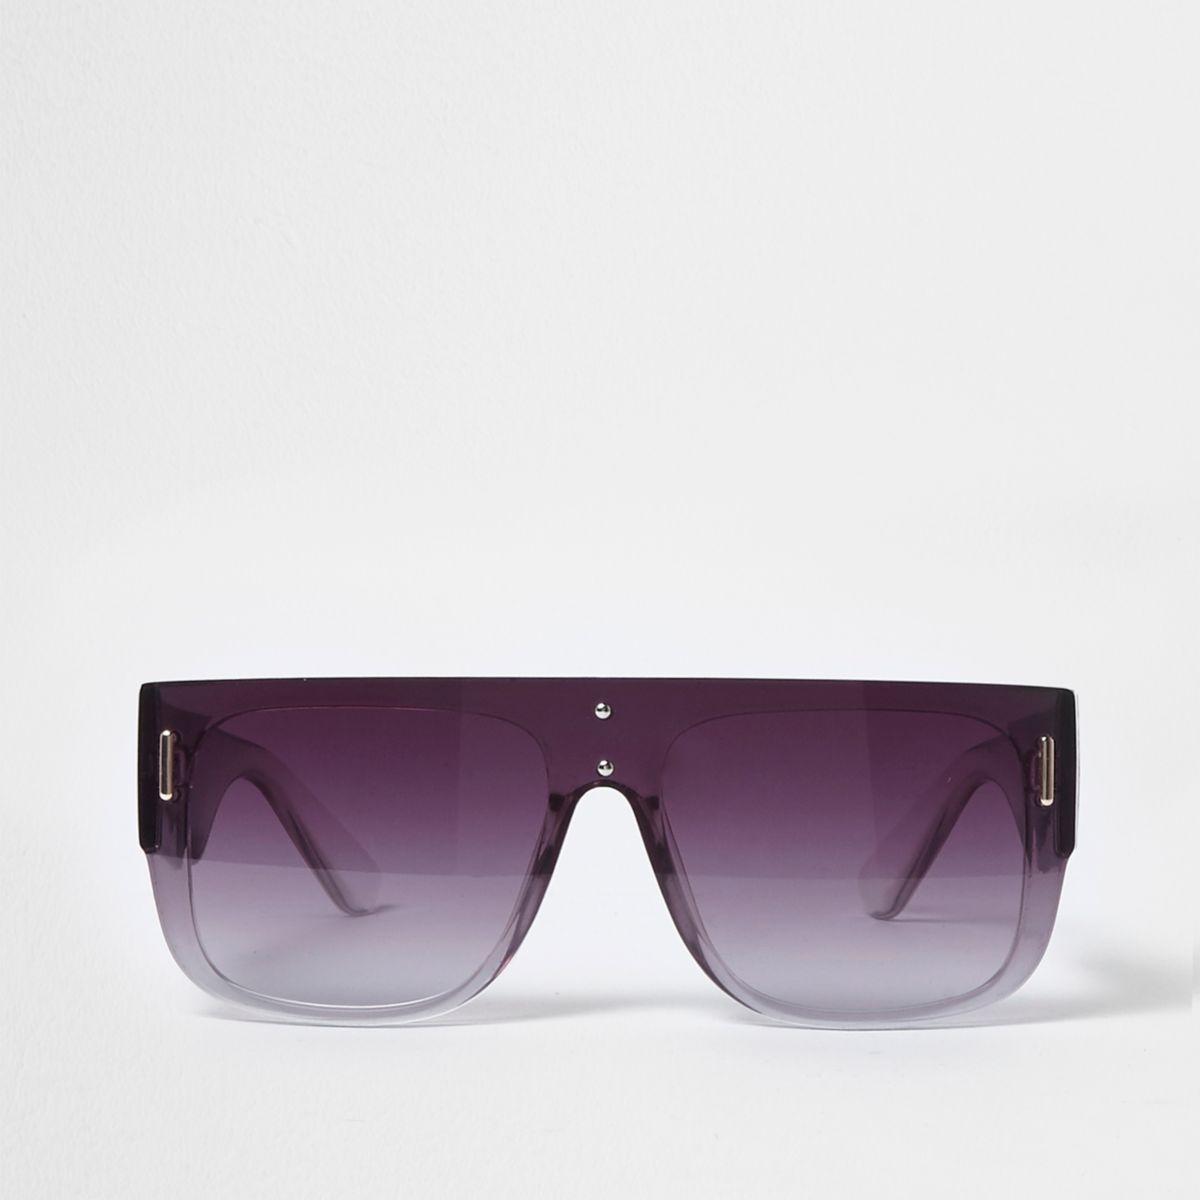 Black flat top smoke tinted sunglasses